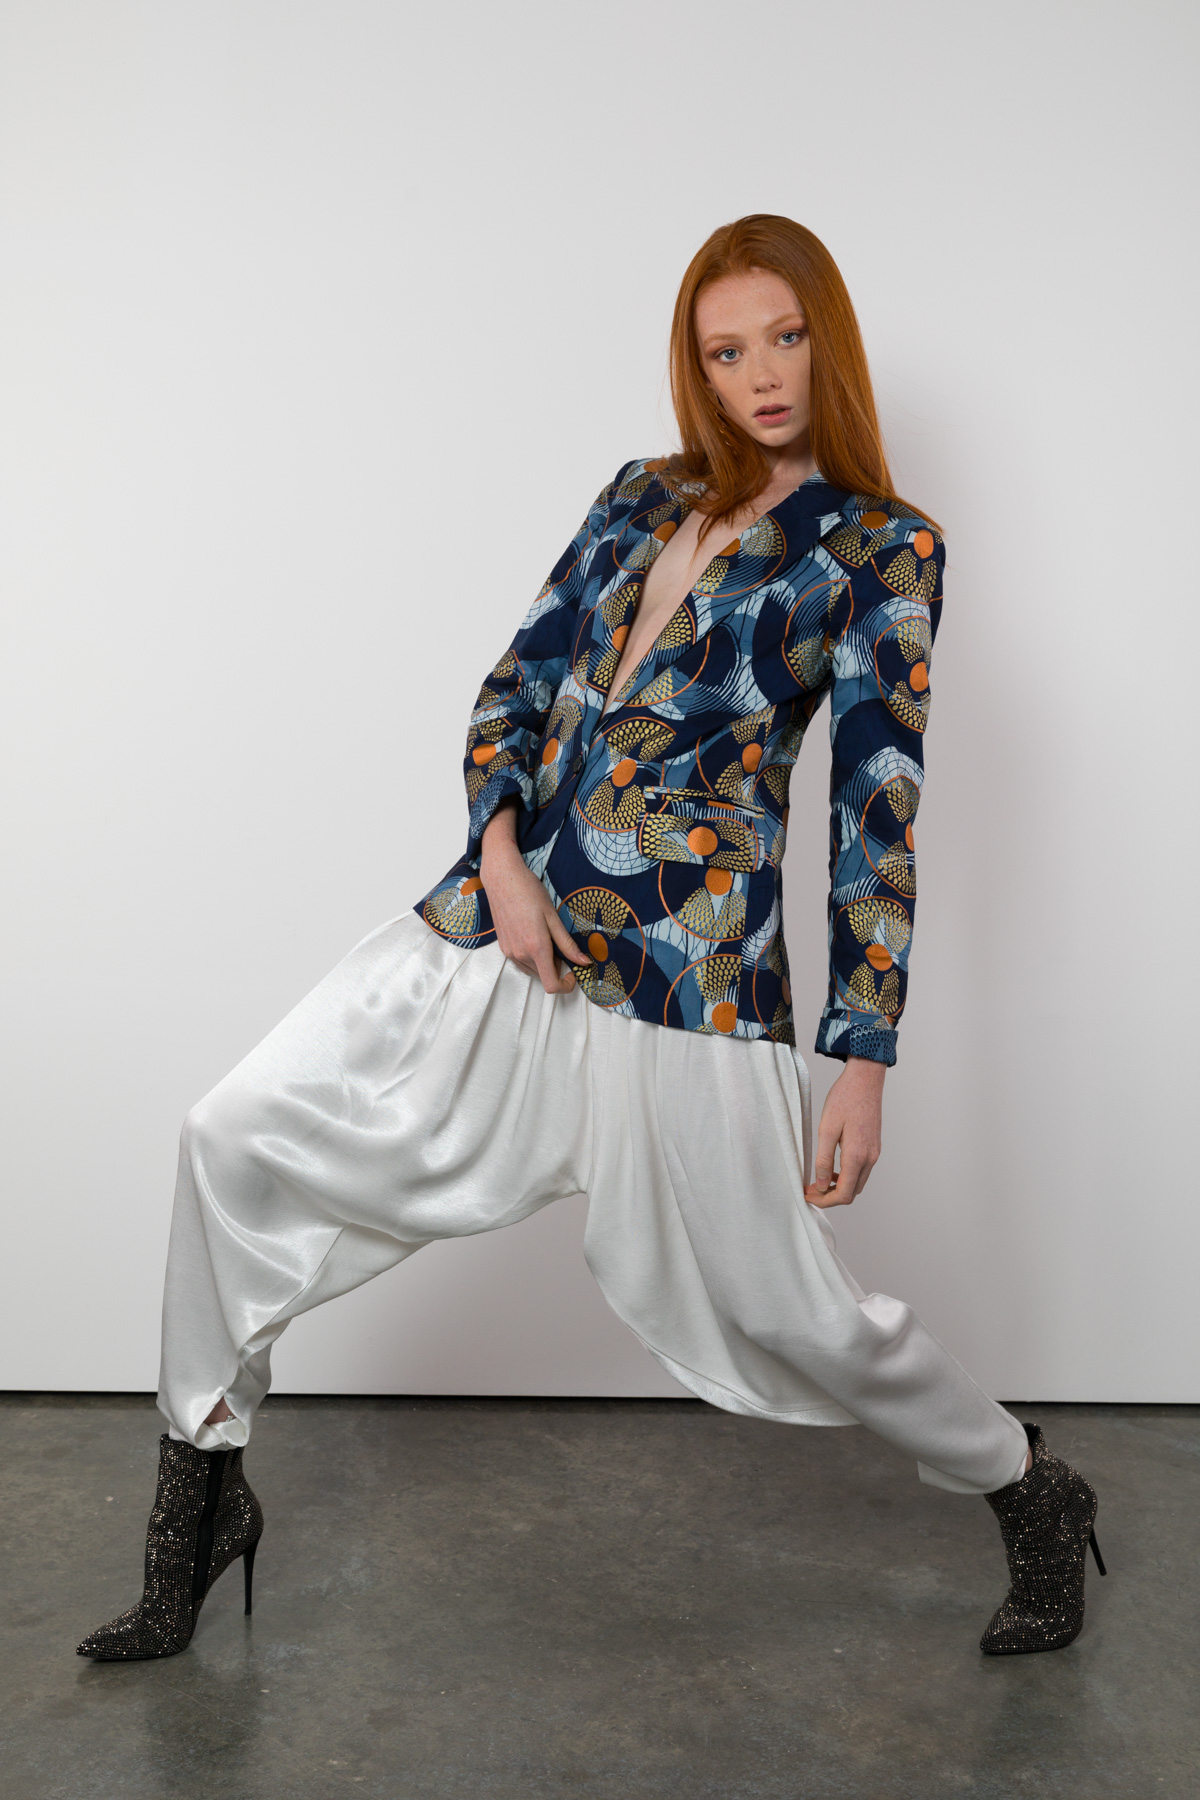 Lookbook shoot with Piper MacKinnon by Loesje Kessels Fashion Photographer Dubai